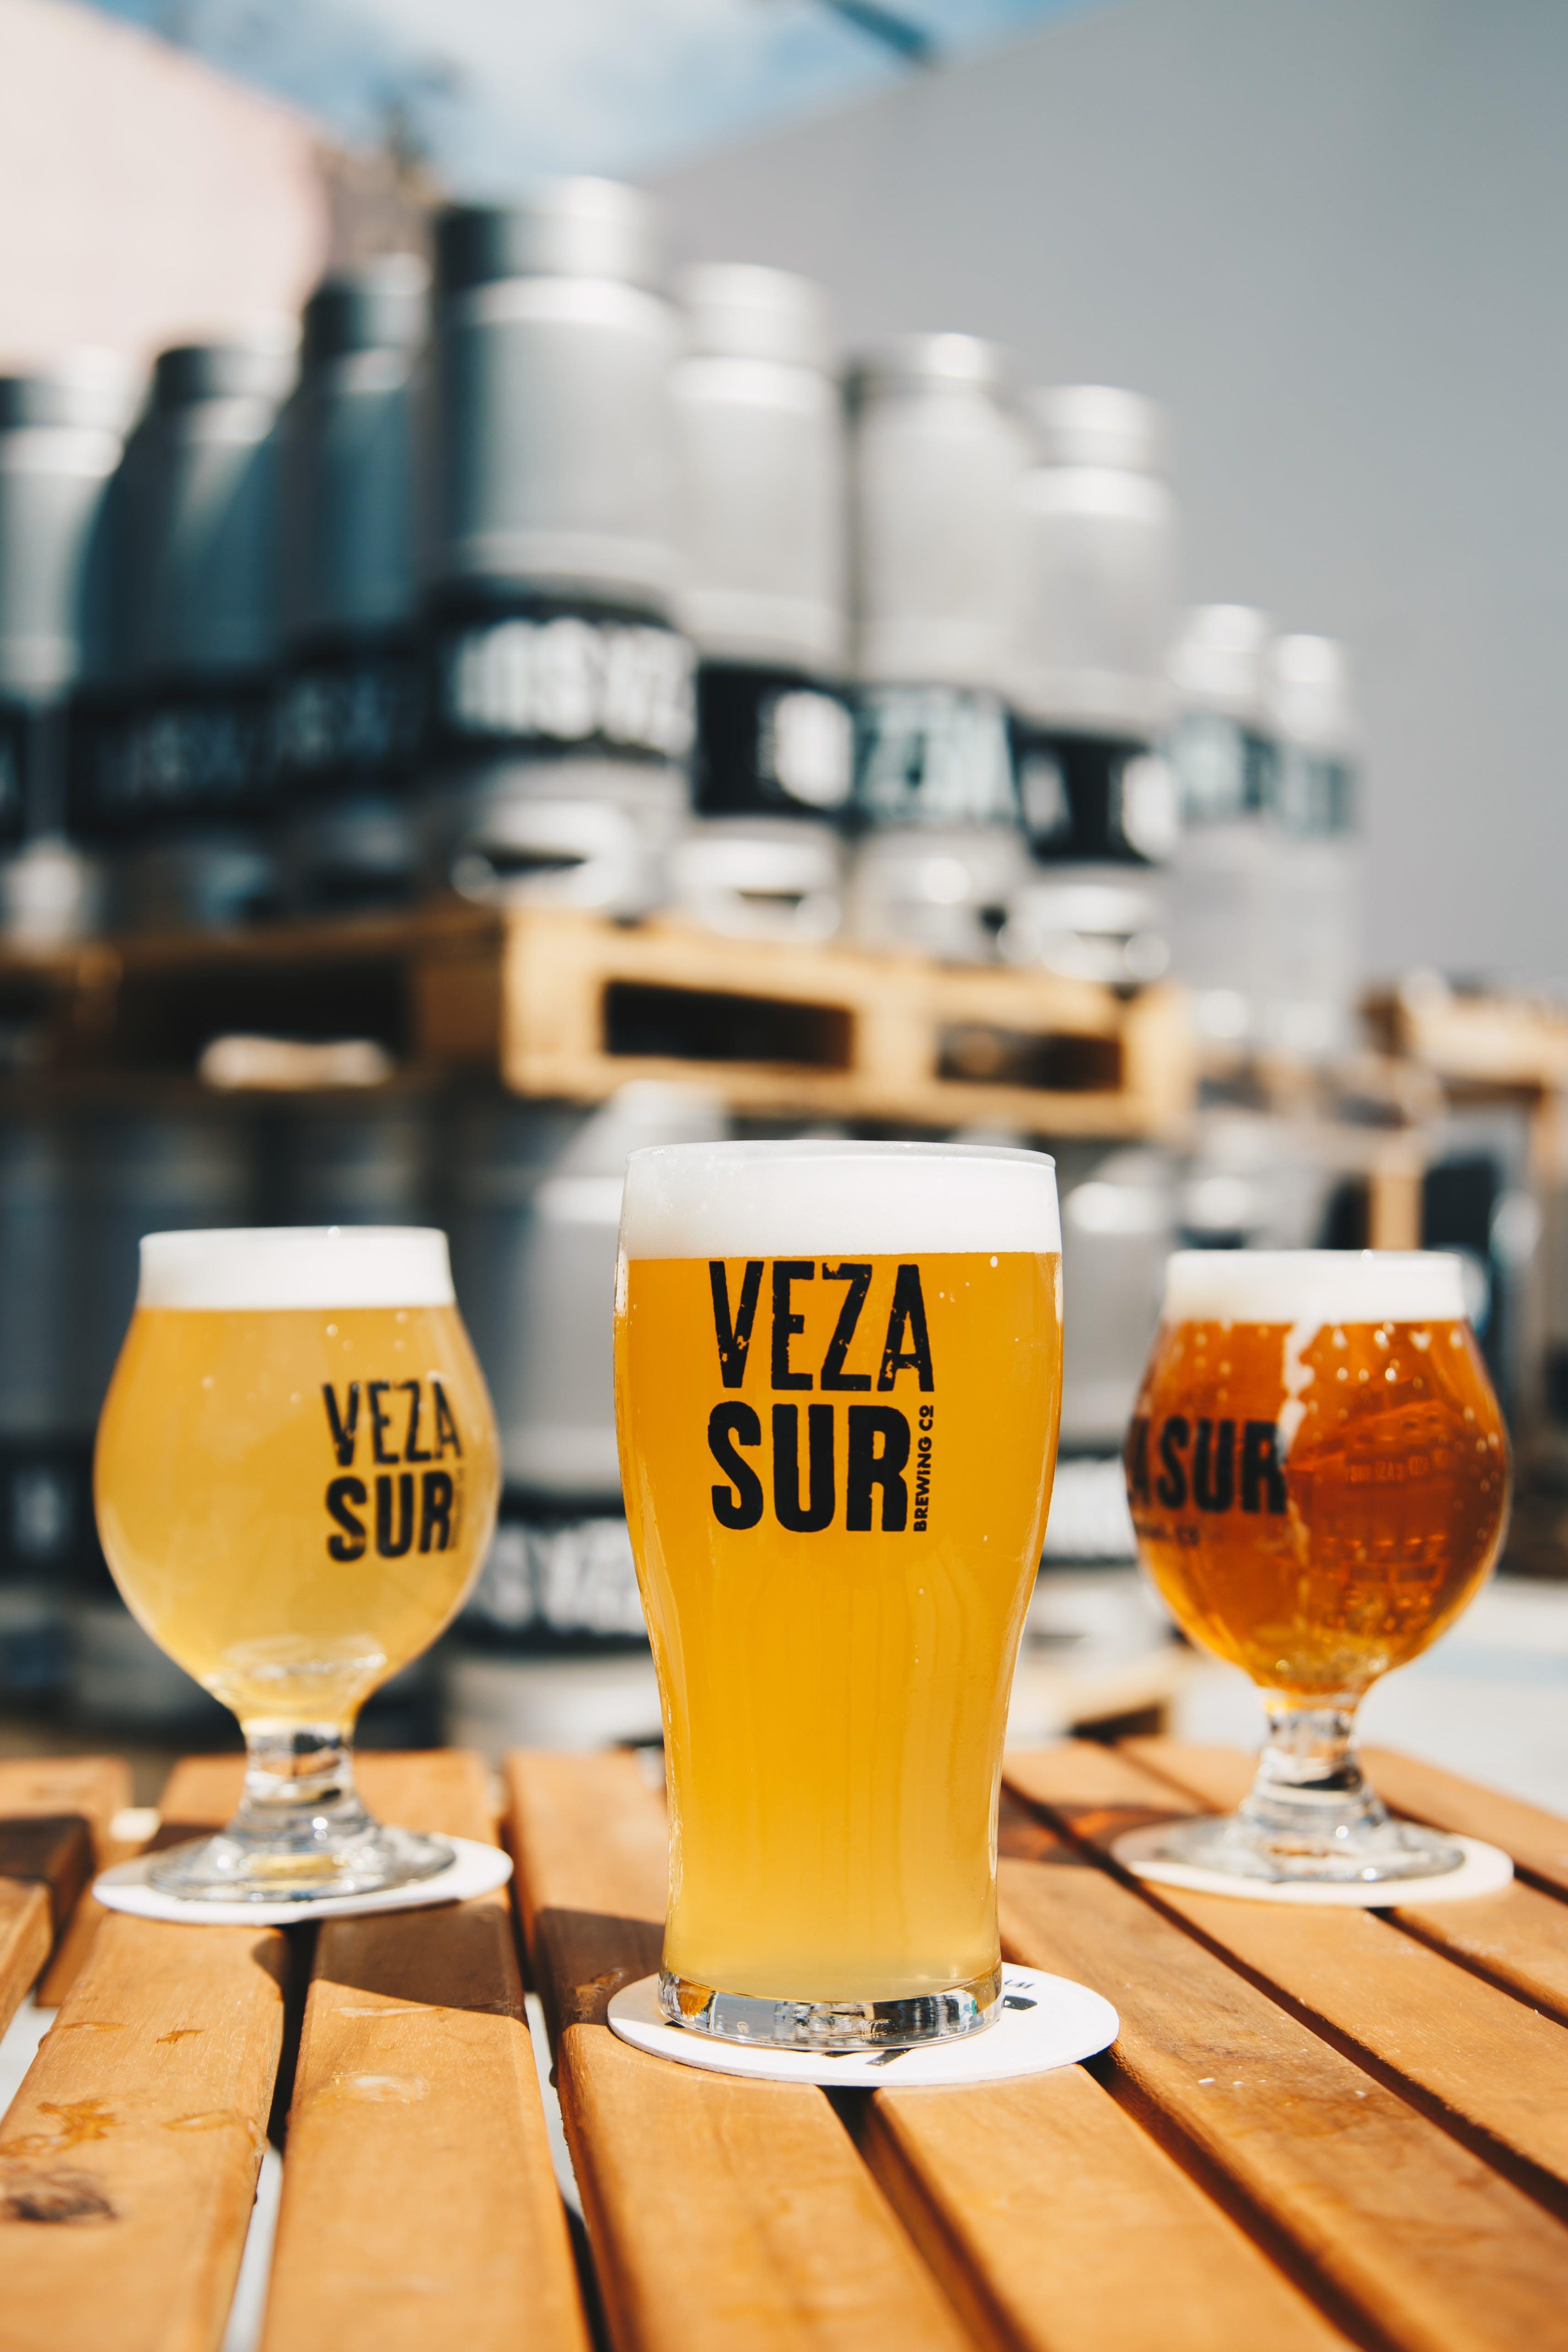 Three Veza Sur Beers